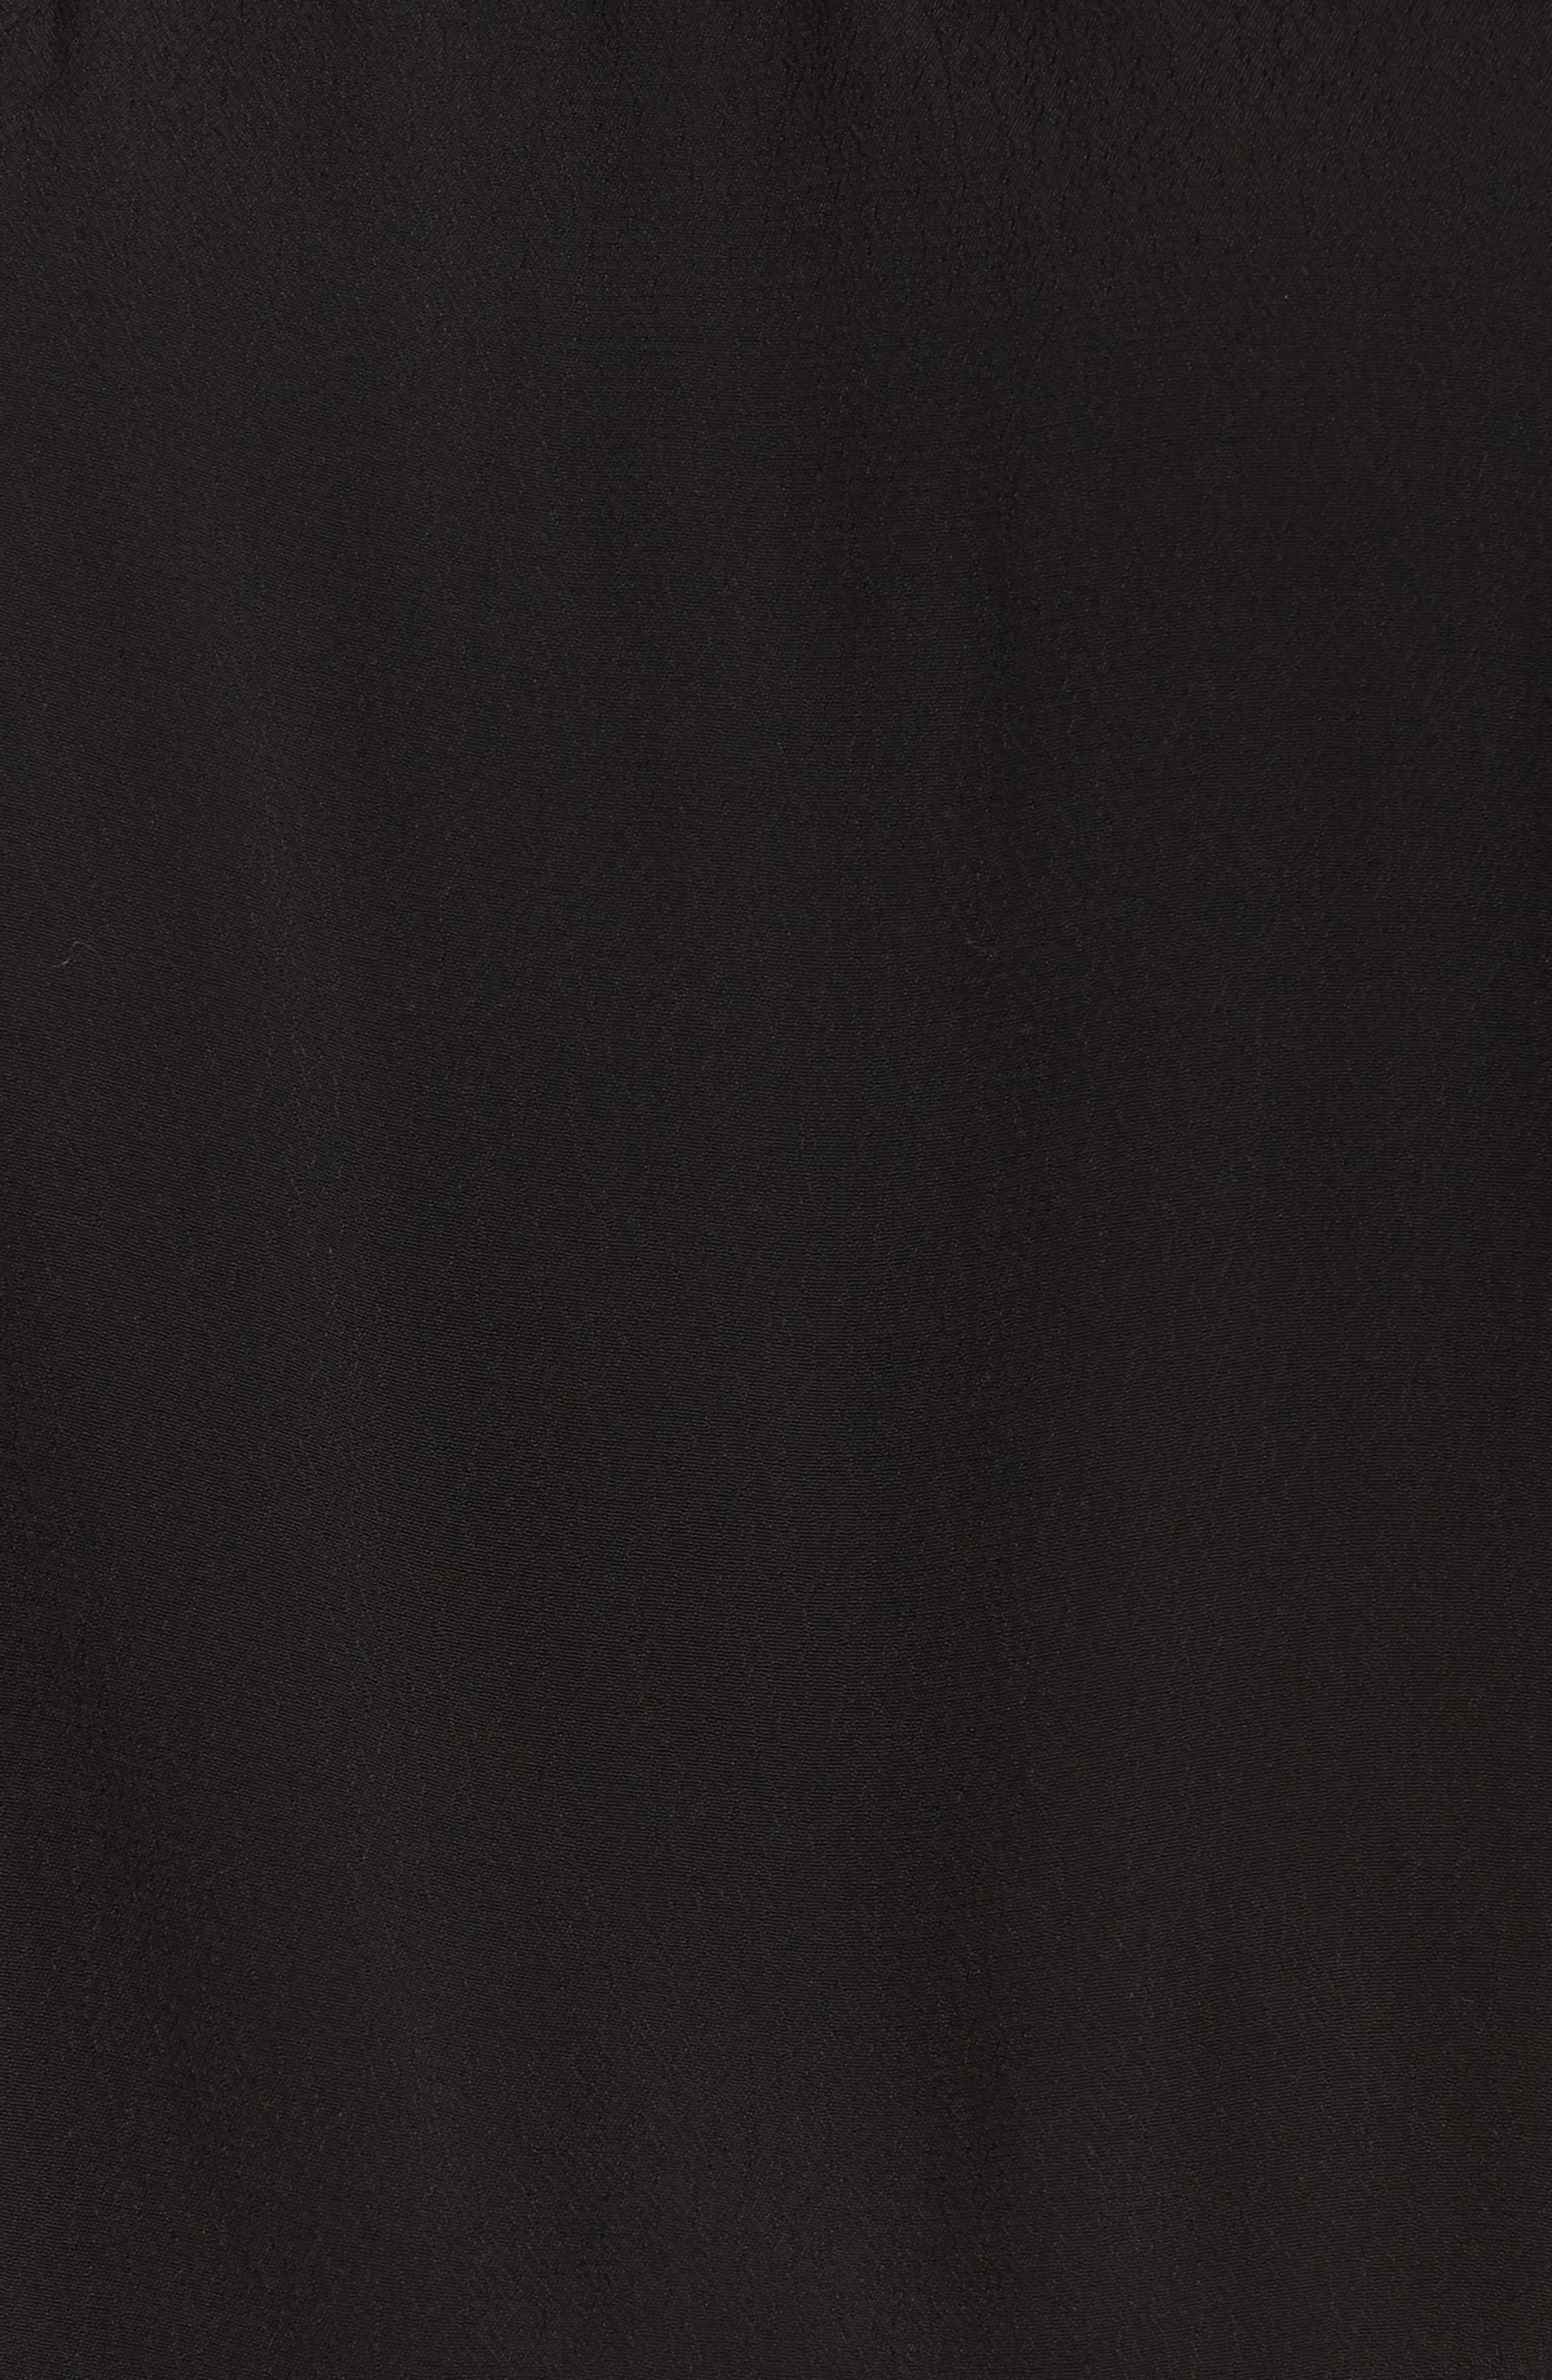 Off the Shoulder Jumpsuit,                             Alternate thumbnail 6, color,                             BLACK